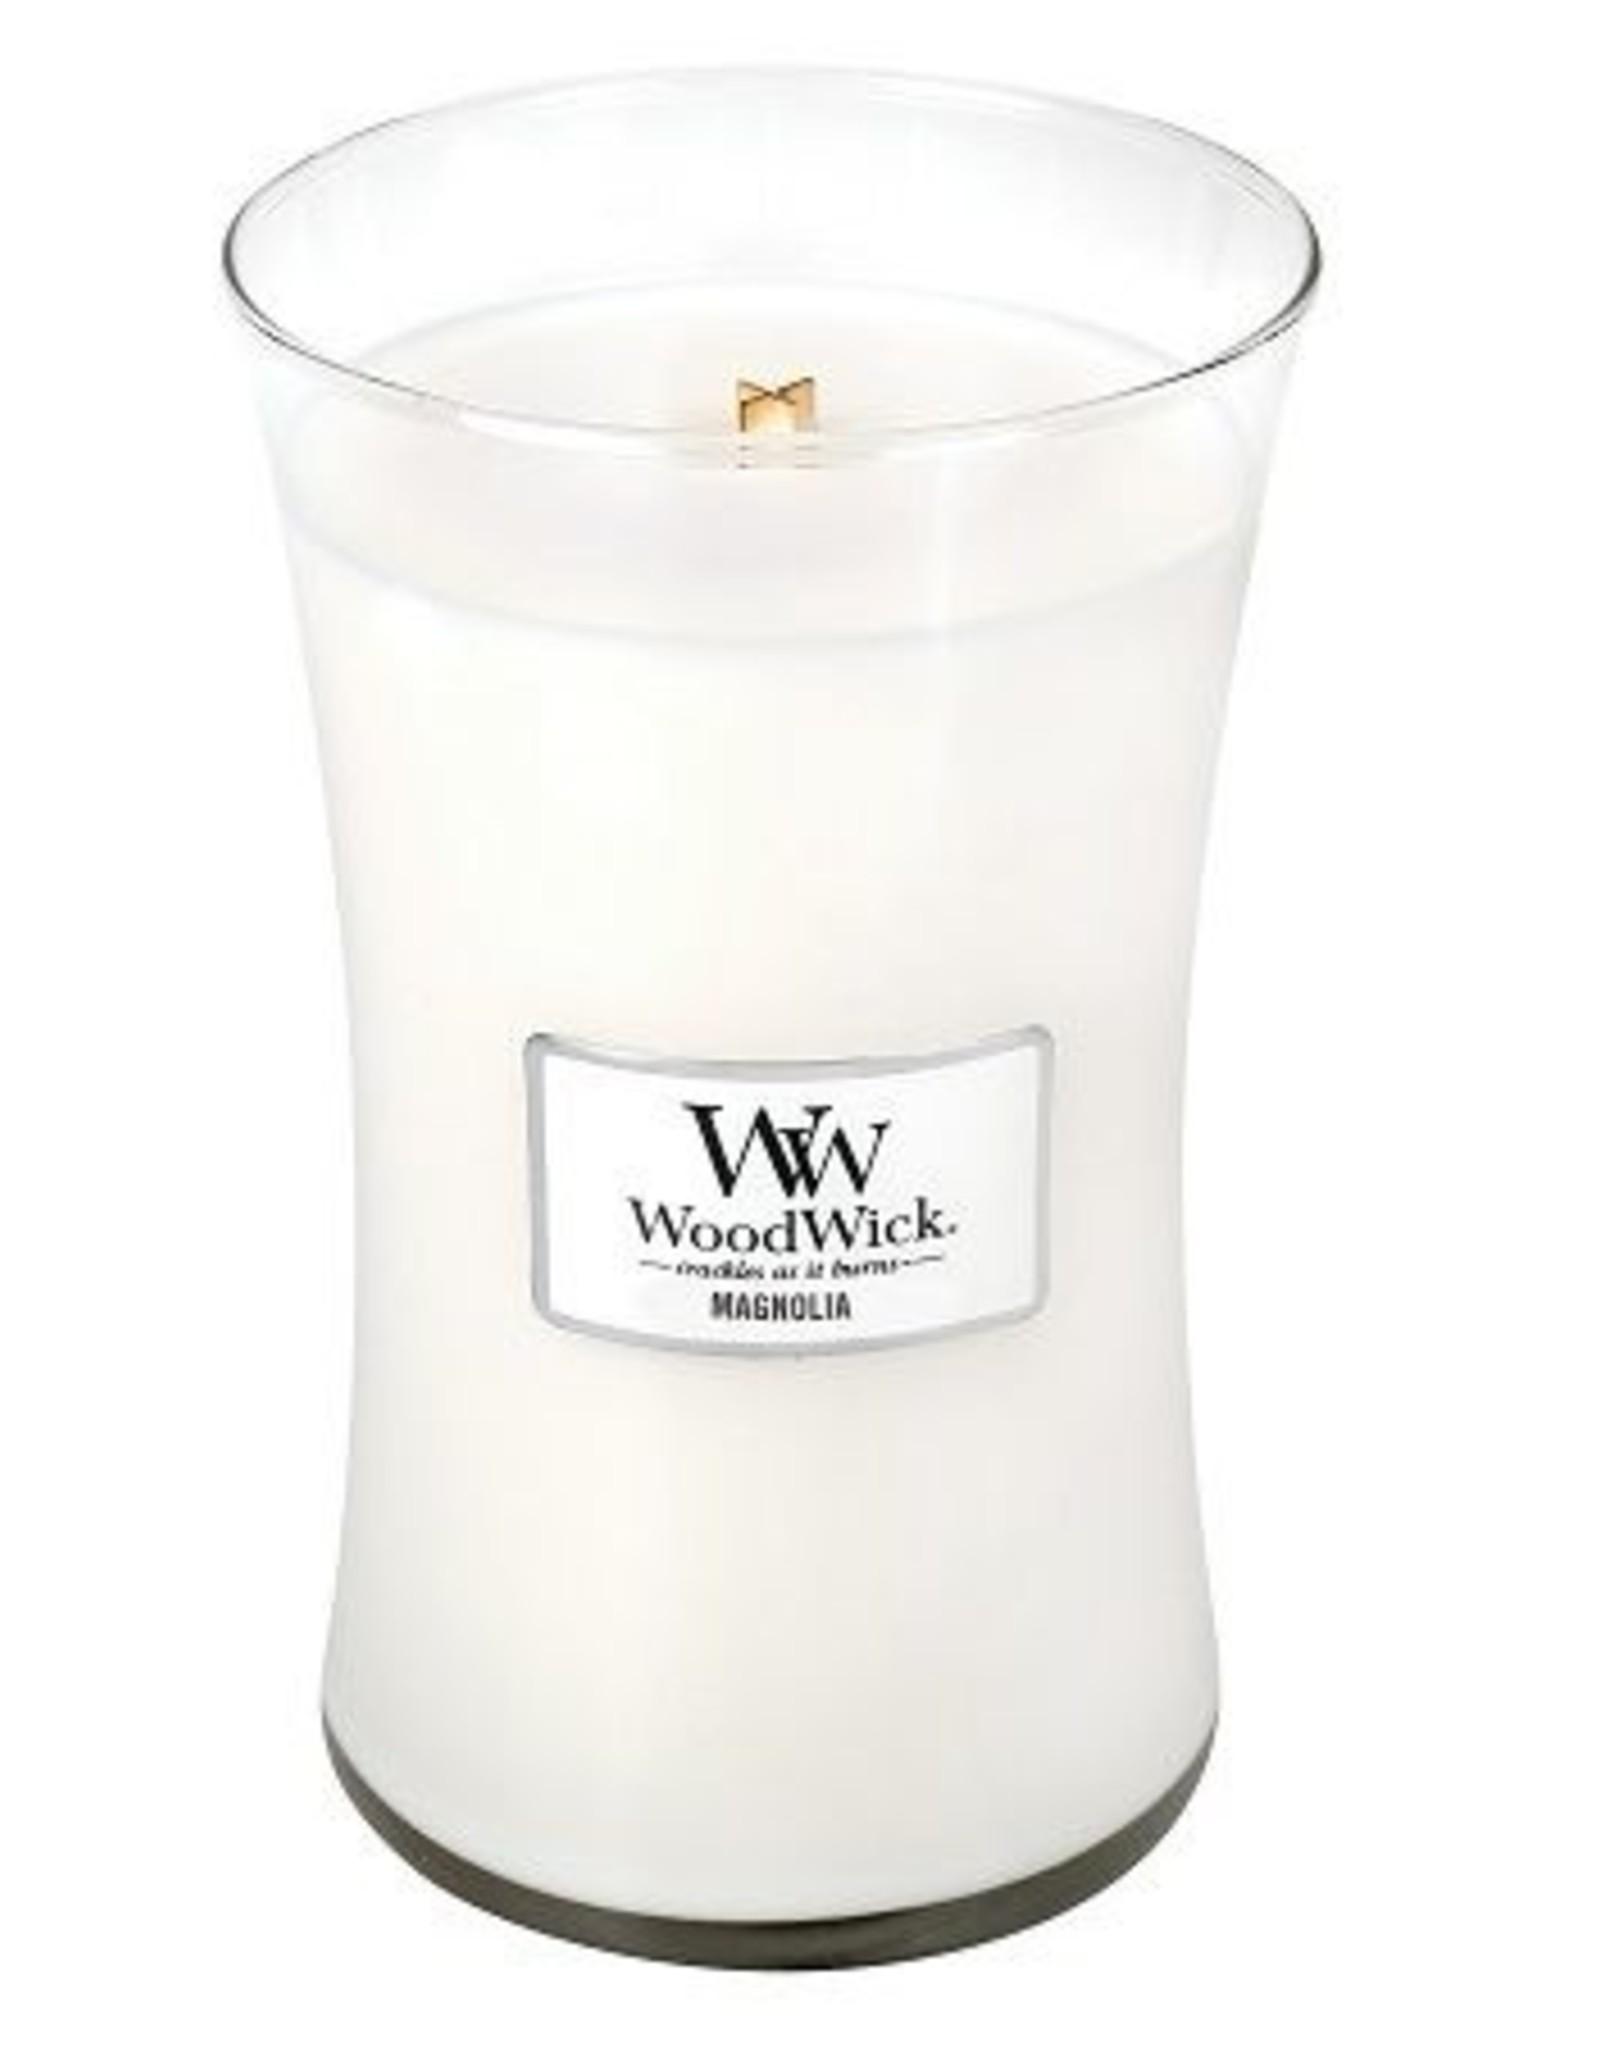 Woodwick Woodwick Magnolia Large Candle